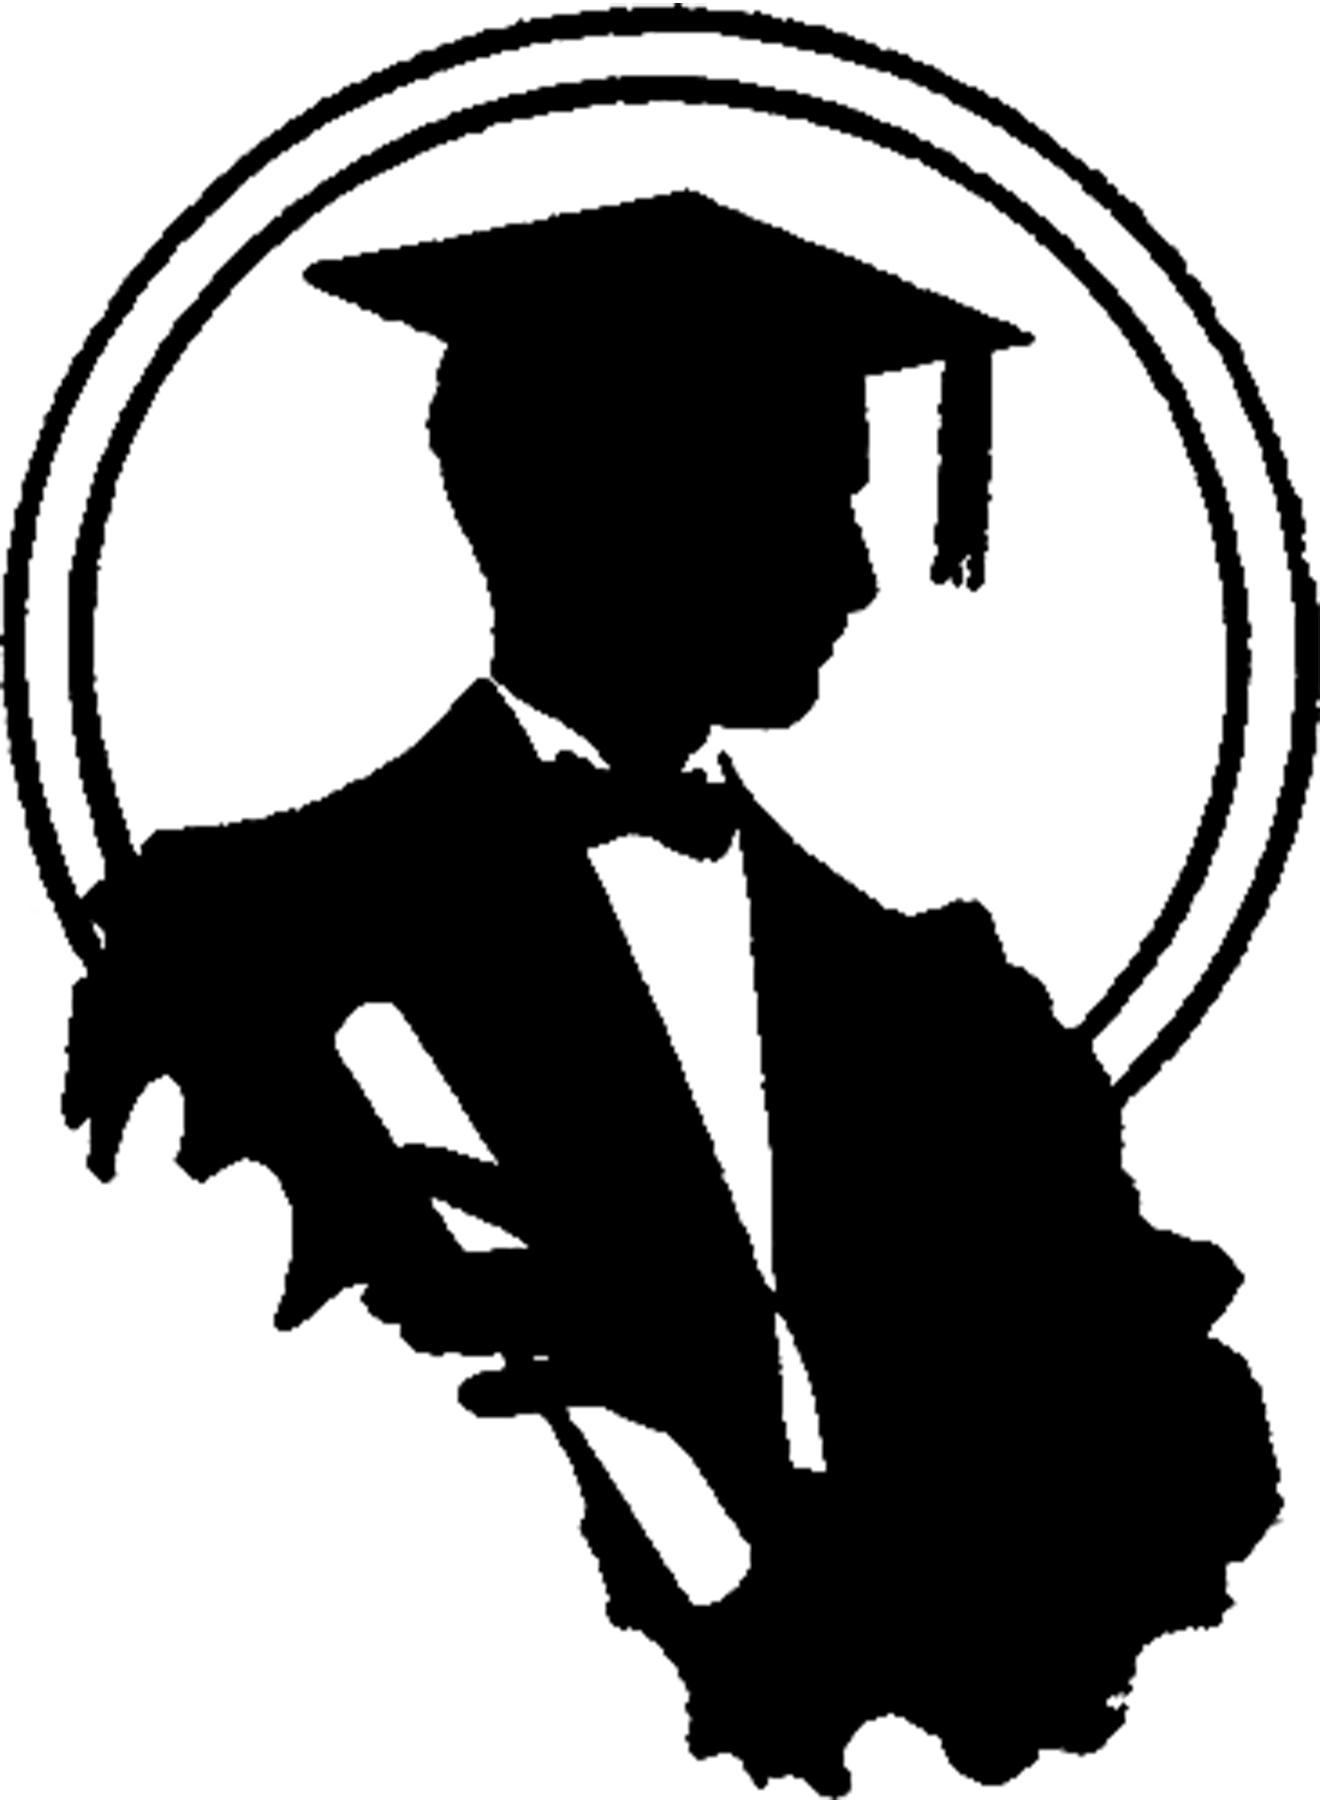 clipart graduate silhouette - Clipground